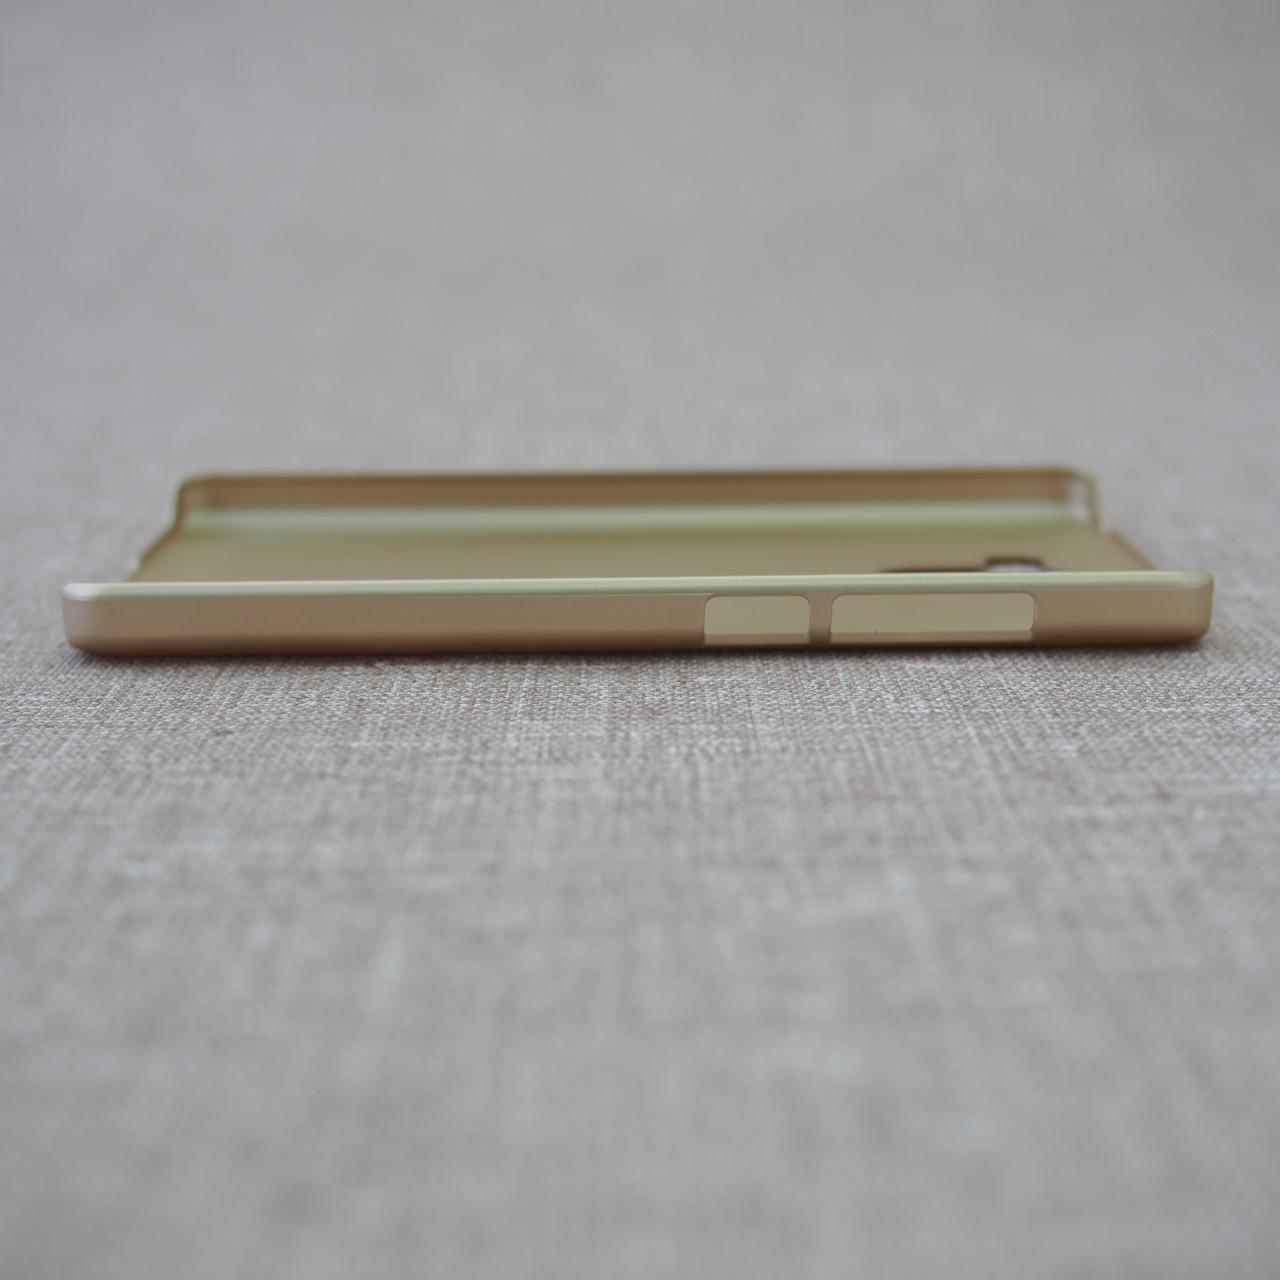 Nillkin Super Frosted Shield Xiaomi Redmi 4 gold Для телефона